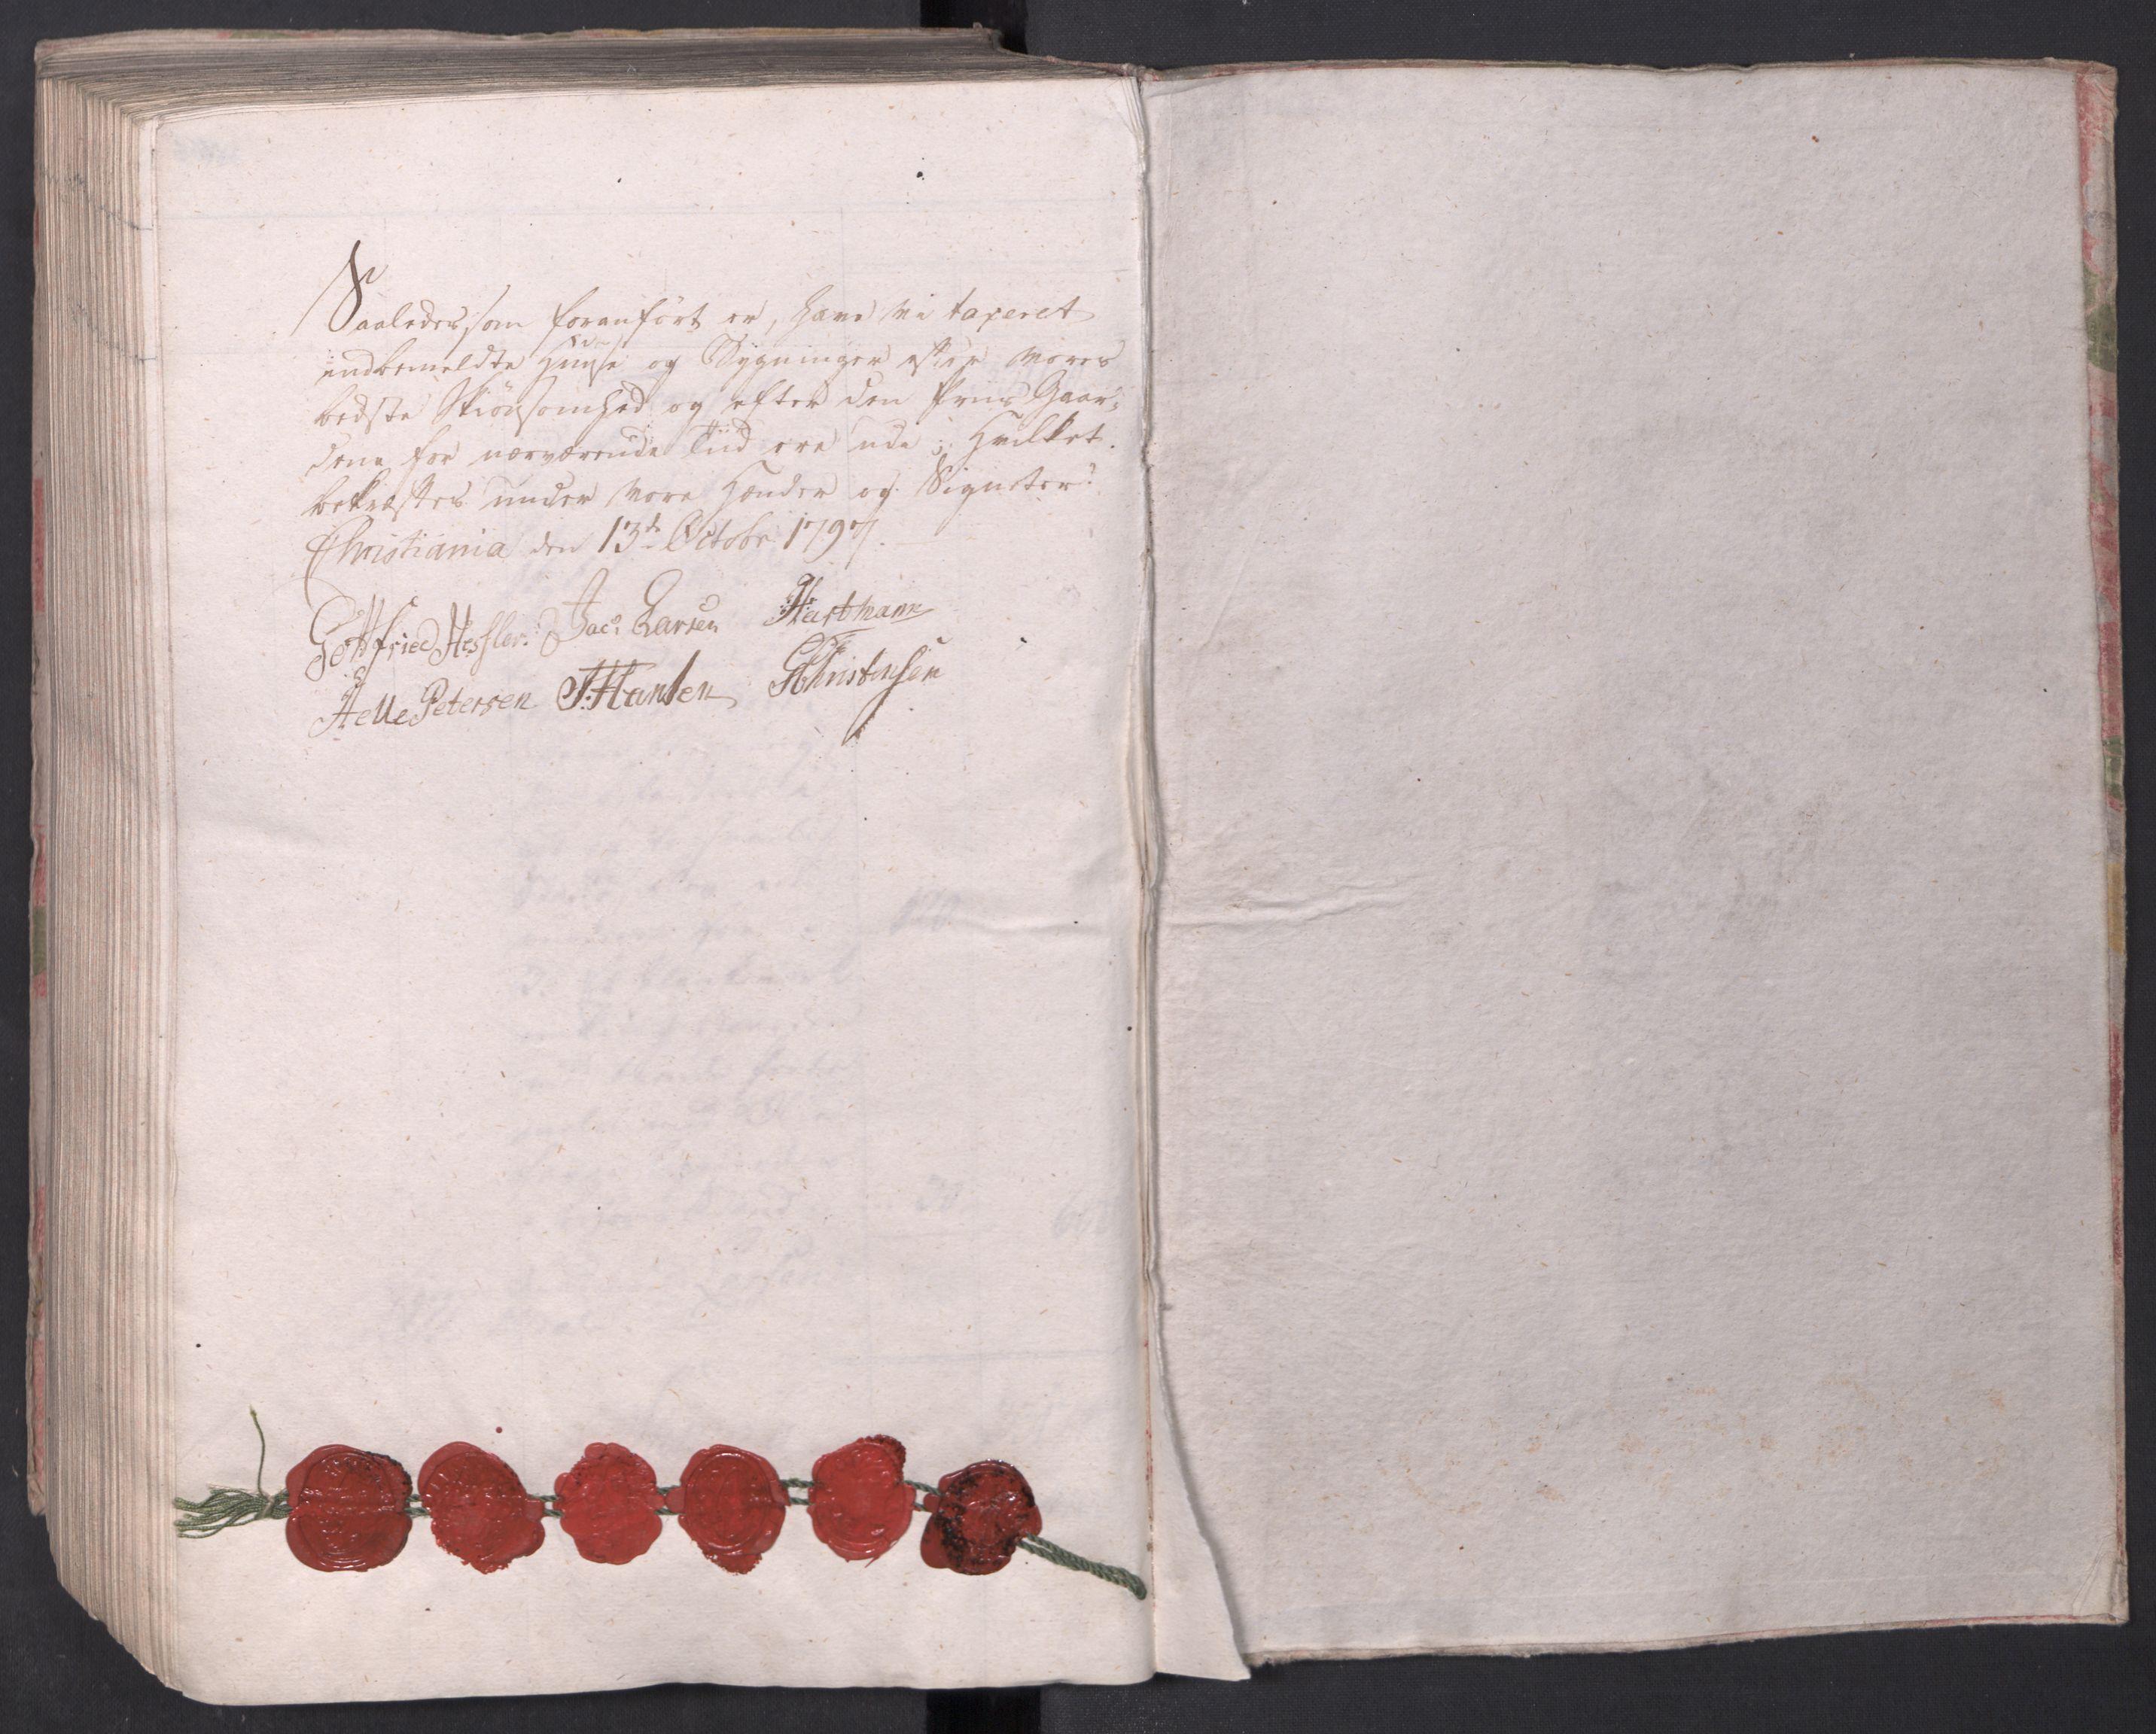 SAO, Kristiania stiftamt, I/Ia/L0015: Branntakster, 1797